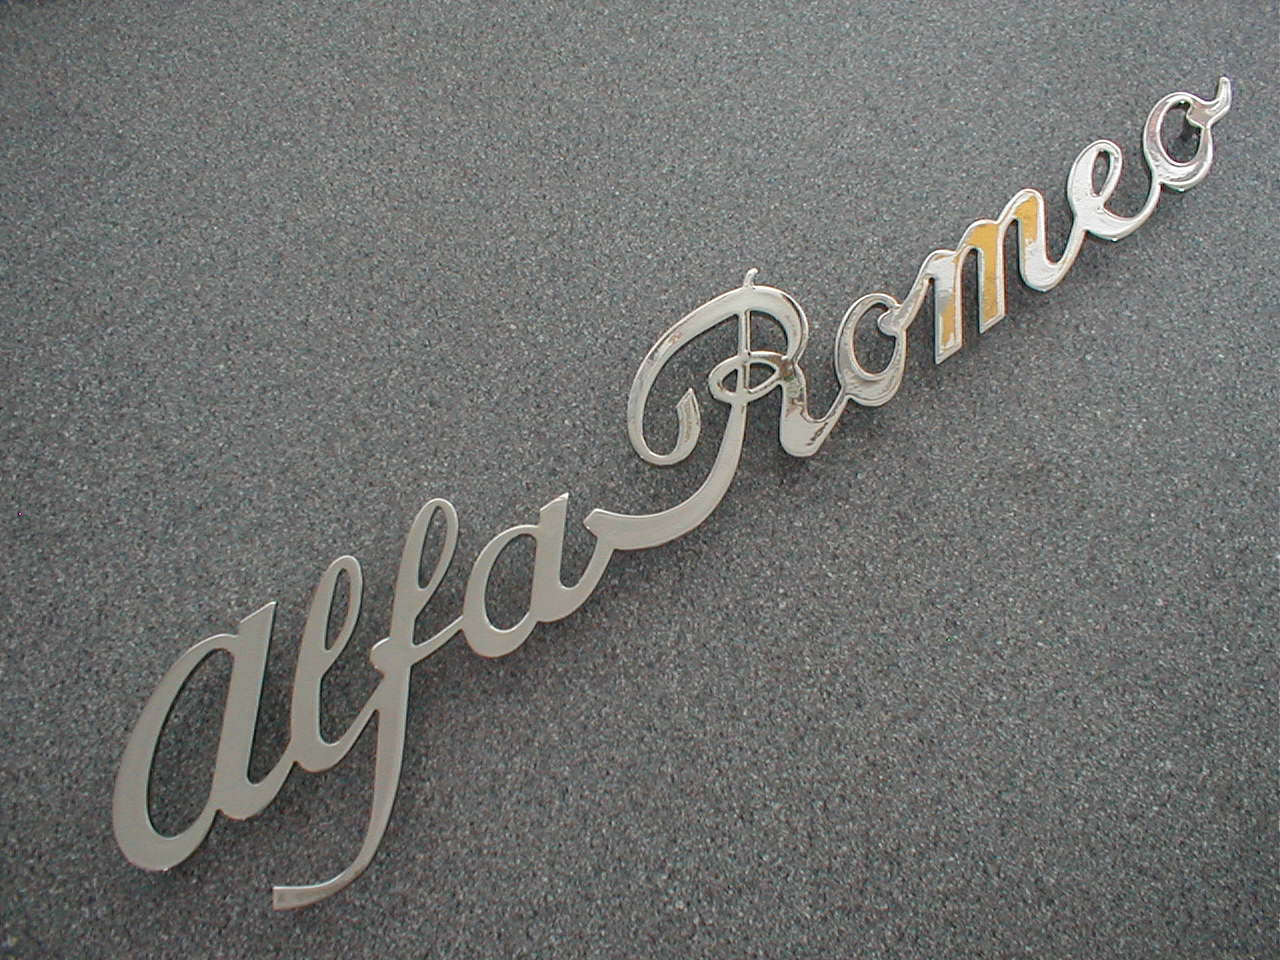 Kh on Alfa Romeo 166 Parts